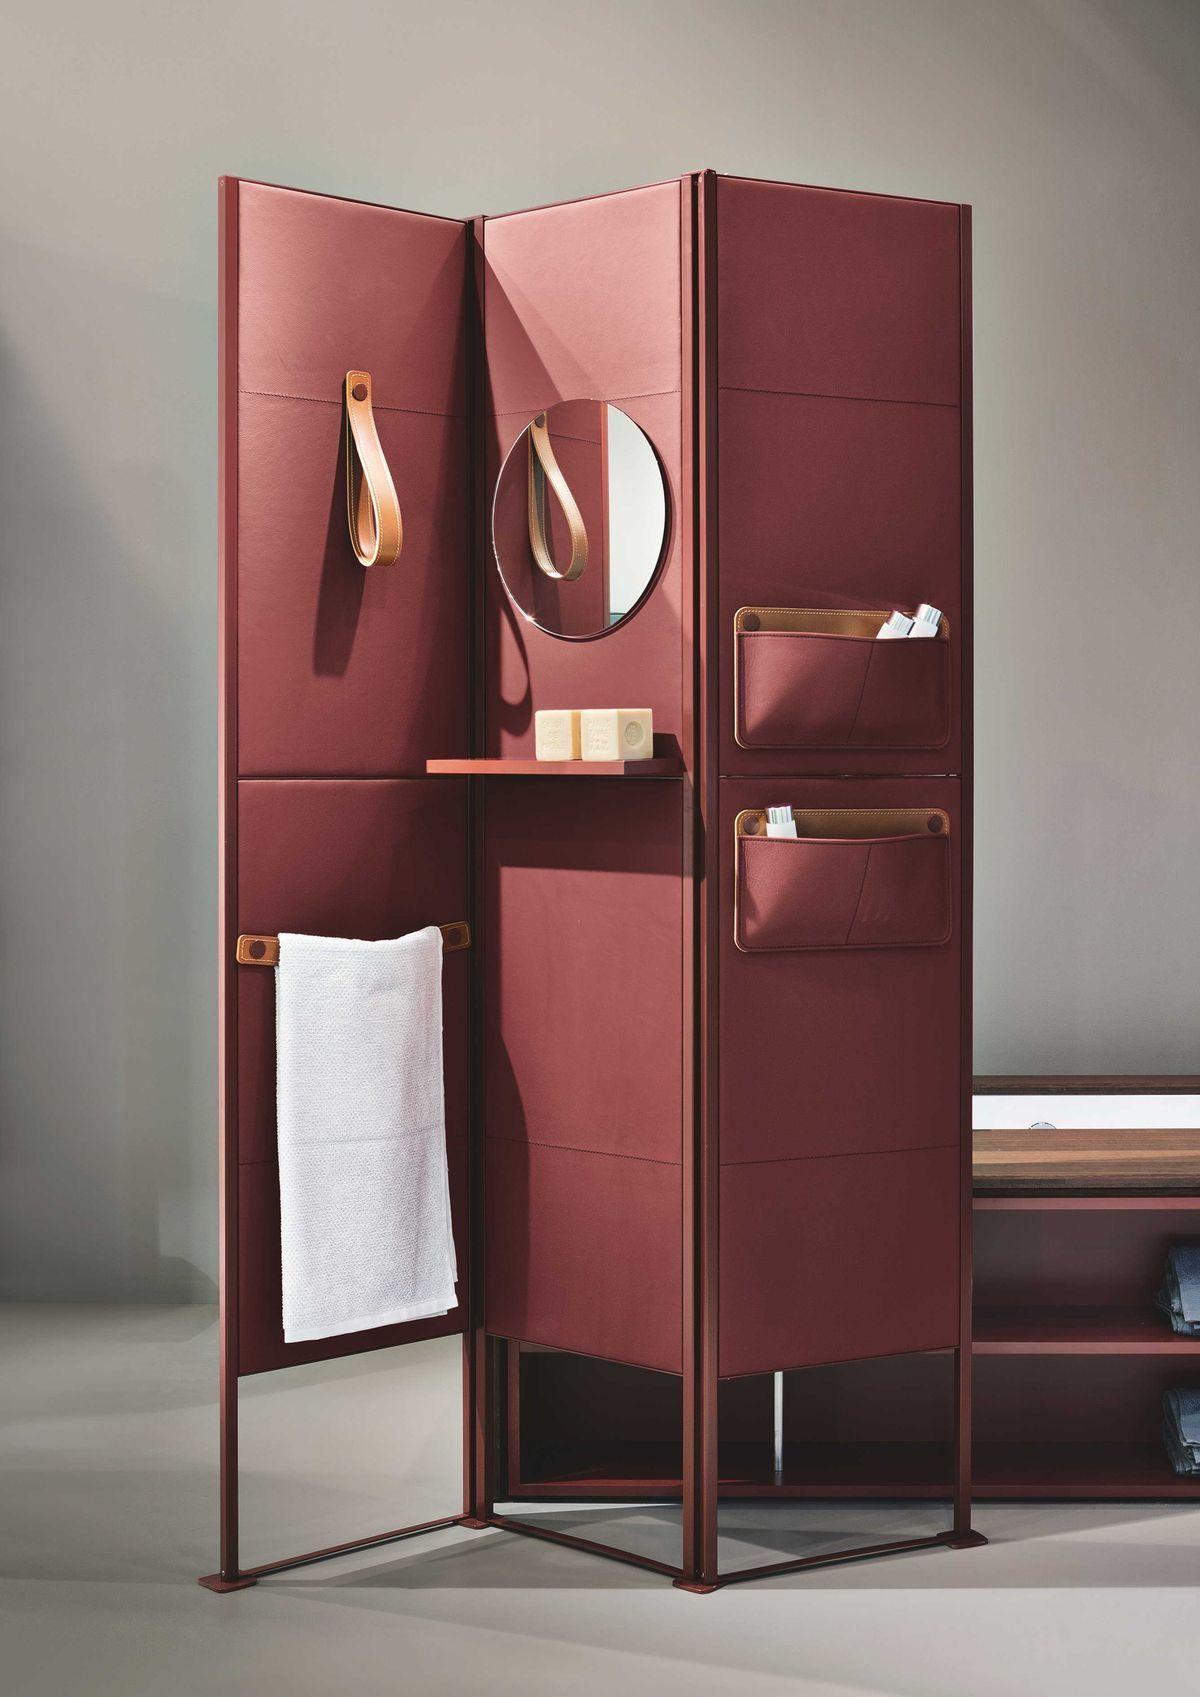 Pin by 红 on 暗雪松色 | Folding screen room divider, Bathroom ...